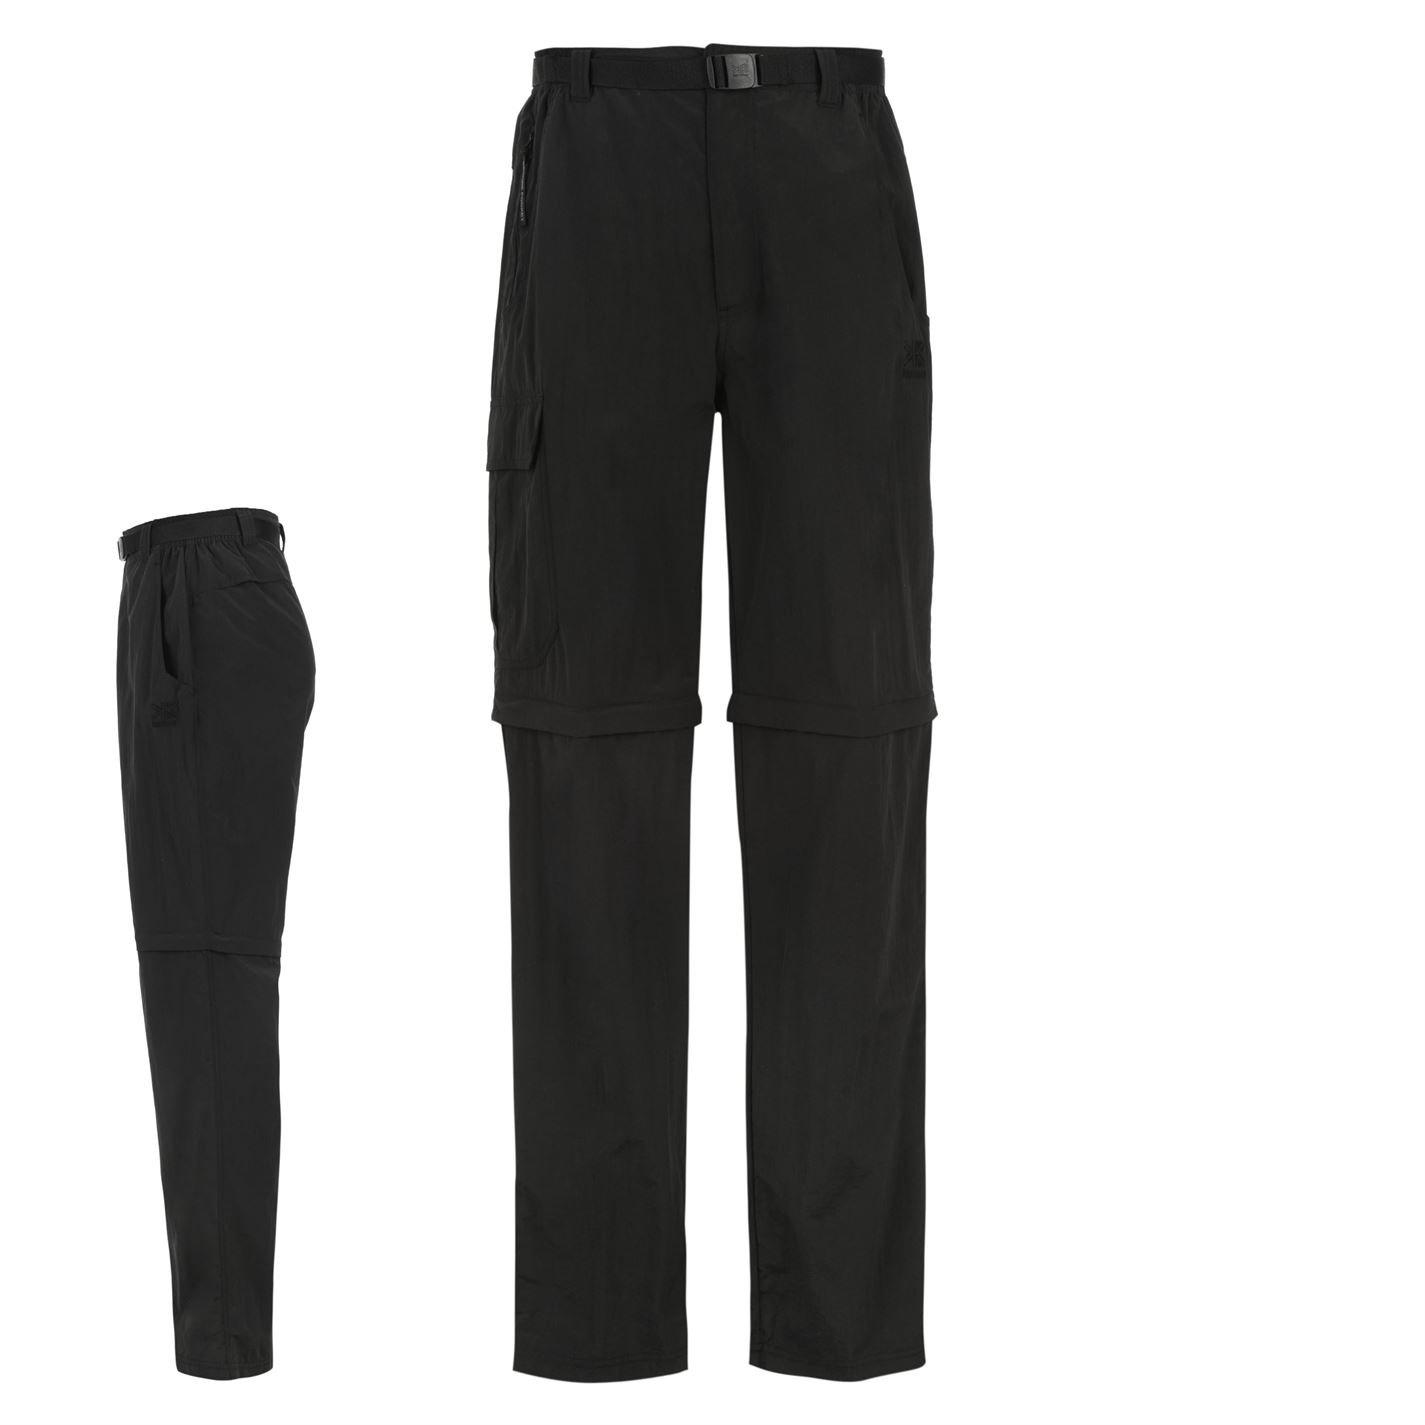 Karrimor Aspen Convertible Trousers Junior Black 13 Yrs